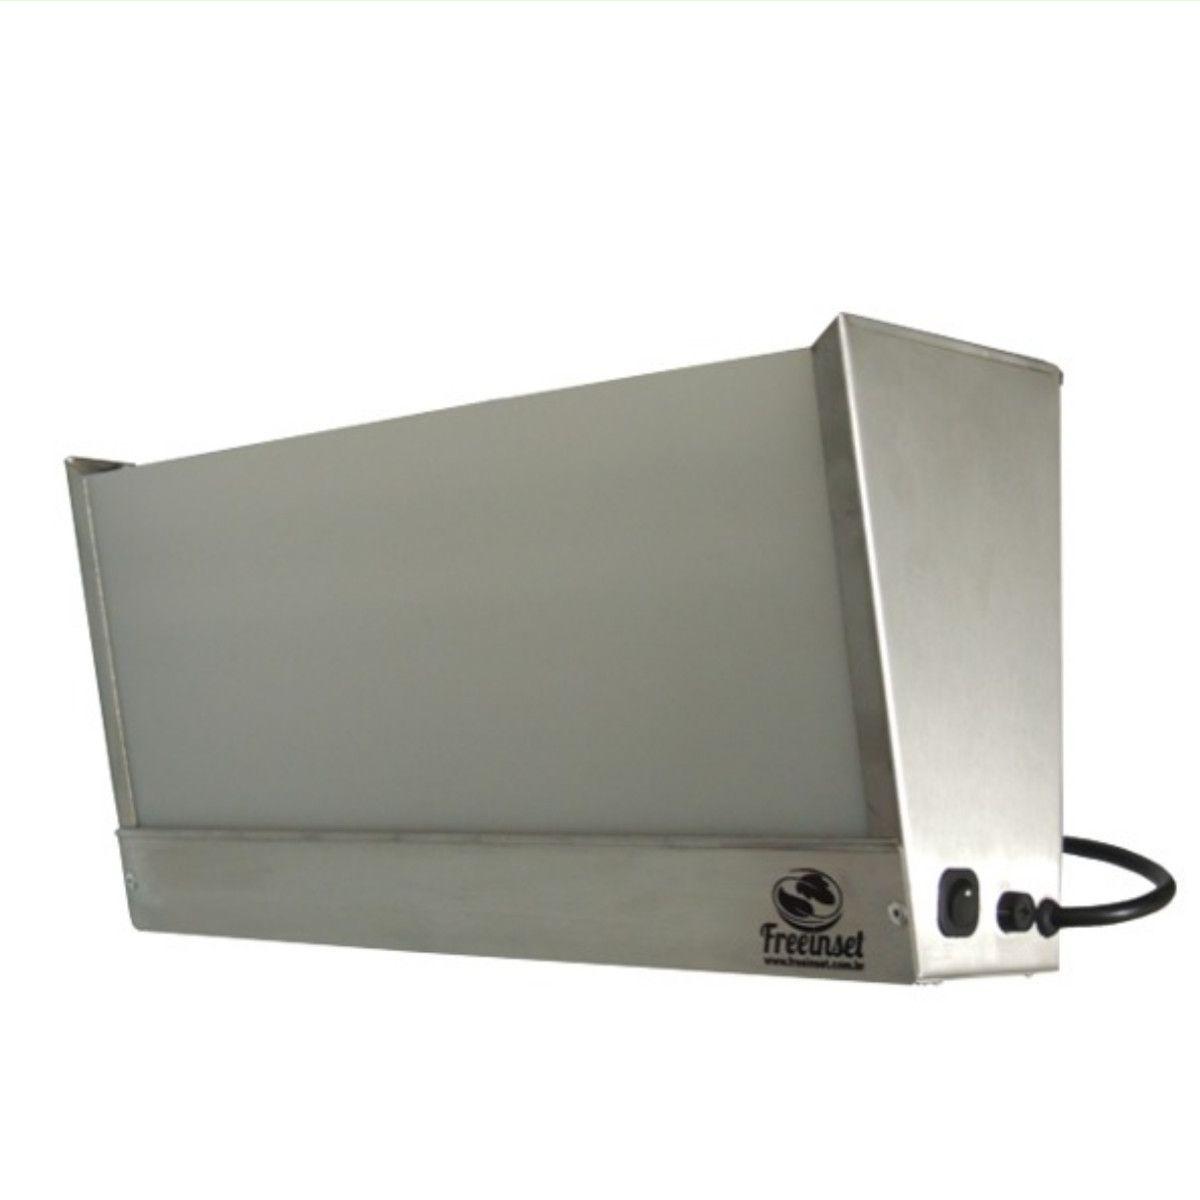 Box 1 Armadilha Luminosa Matar Mosca mosquito Inox 15w 25m2